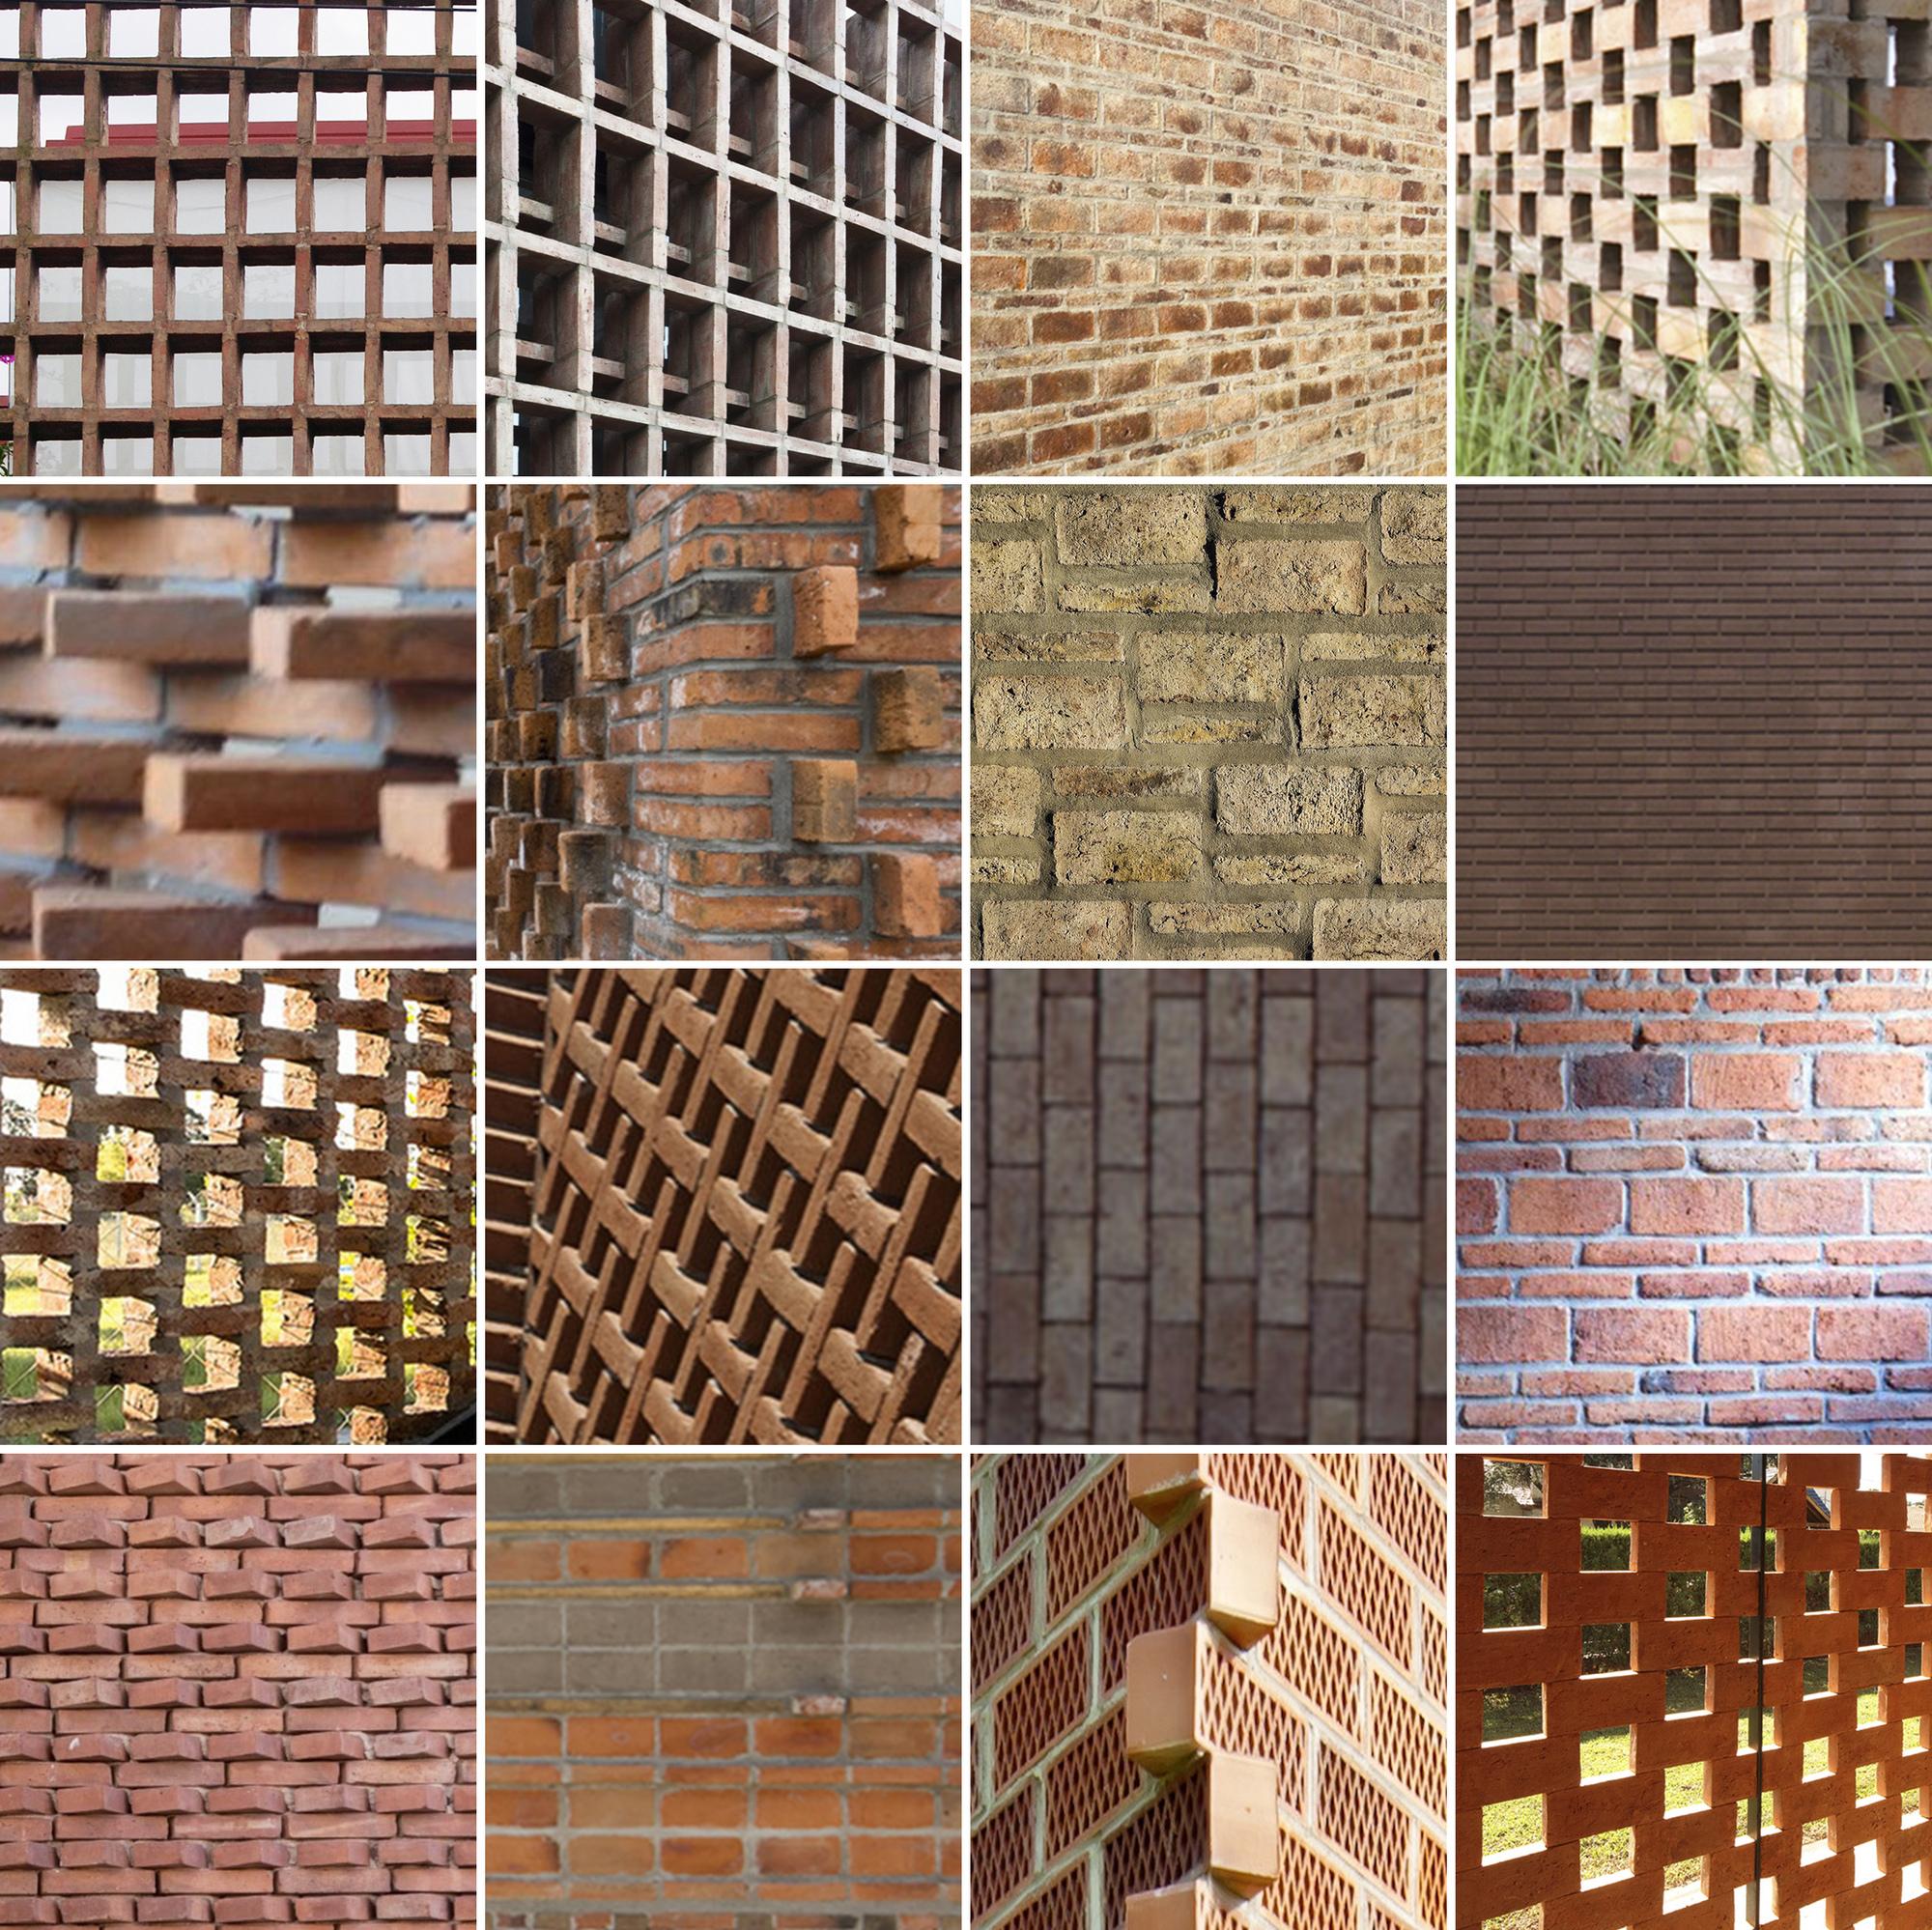 16 details of impressive brickwork archdaily - Tipos de ladrillos huecos ...